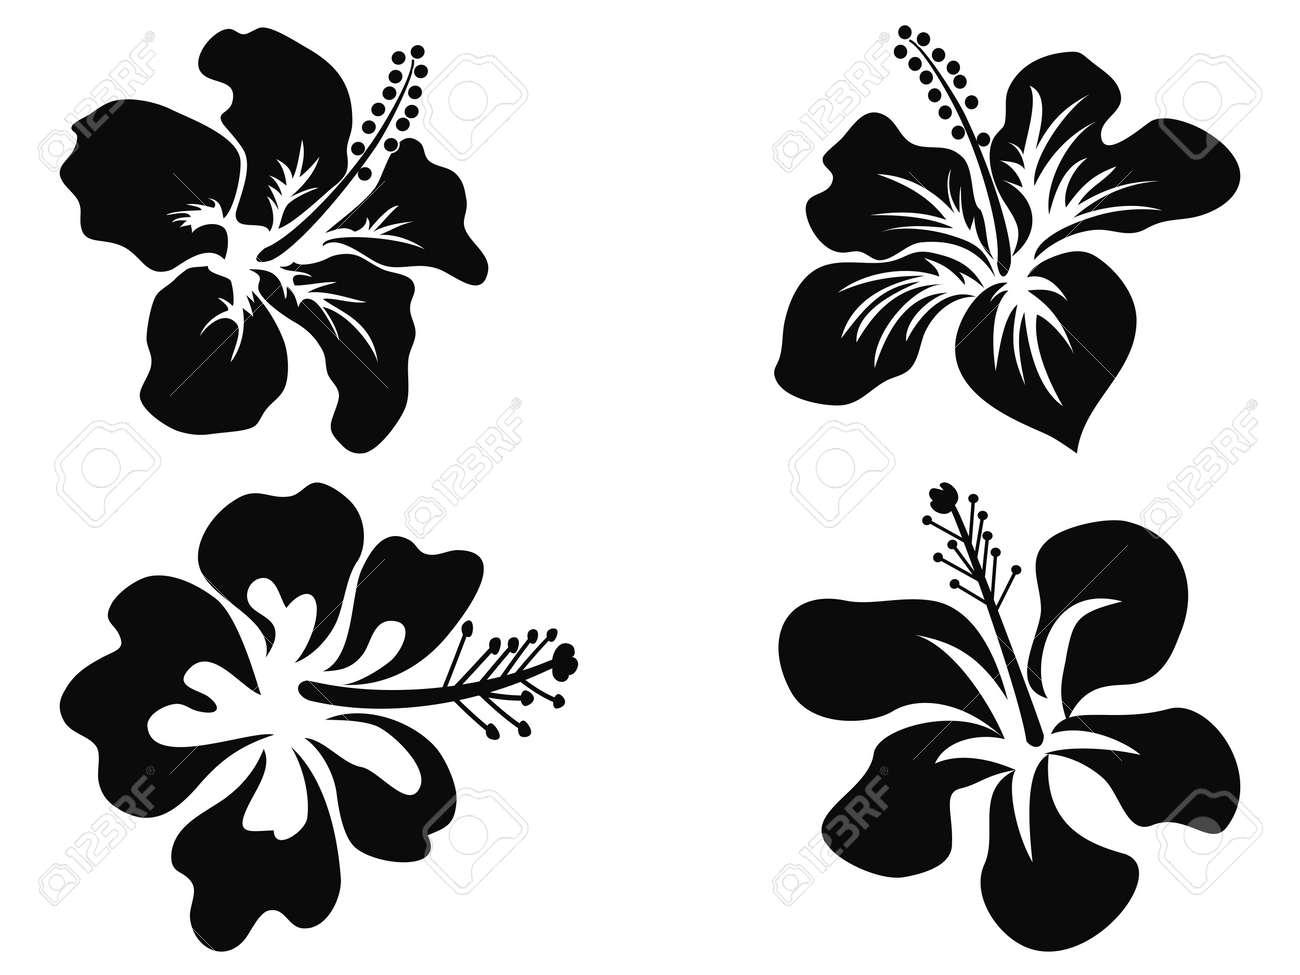 Tatouage Fleur Hibiscus Excellent Related Post With Tatouage Fleur